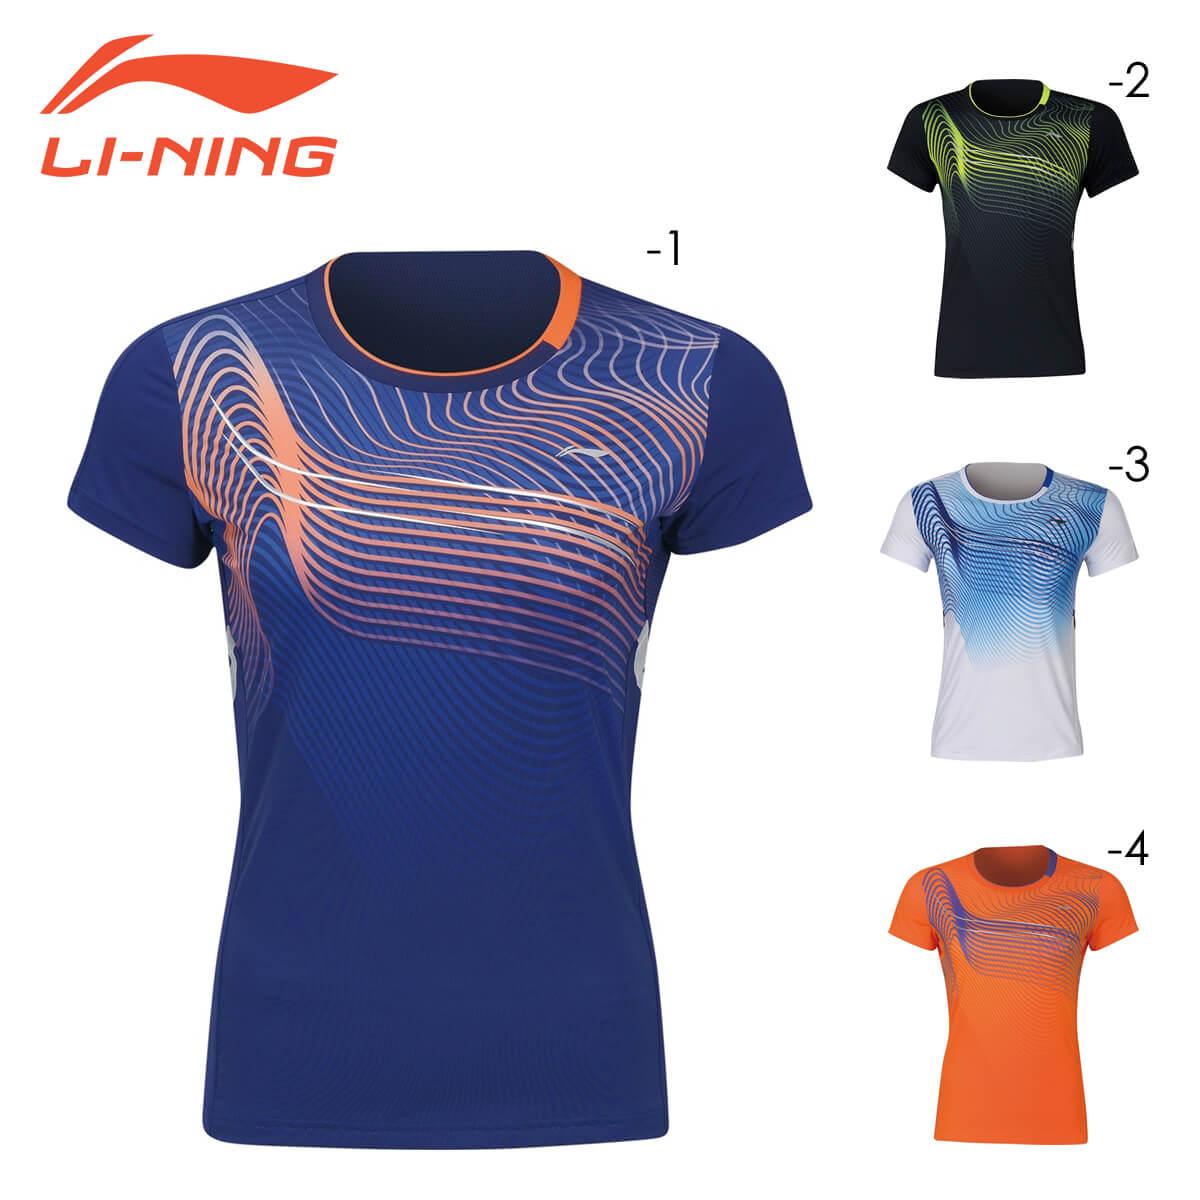 LI-NING AAYQ086 ゲームシャツ レディース 期間限定で特別価格 中国ナショナルチーム バドミントンウェア 日本バドミントン協会審査合格品 リーニン 蔵 メール便可